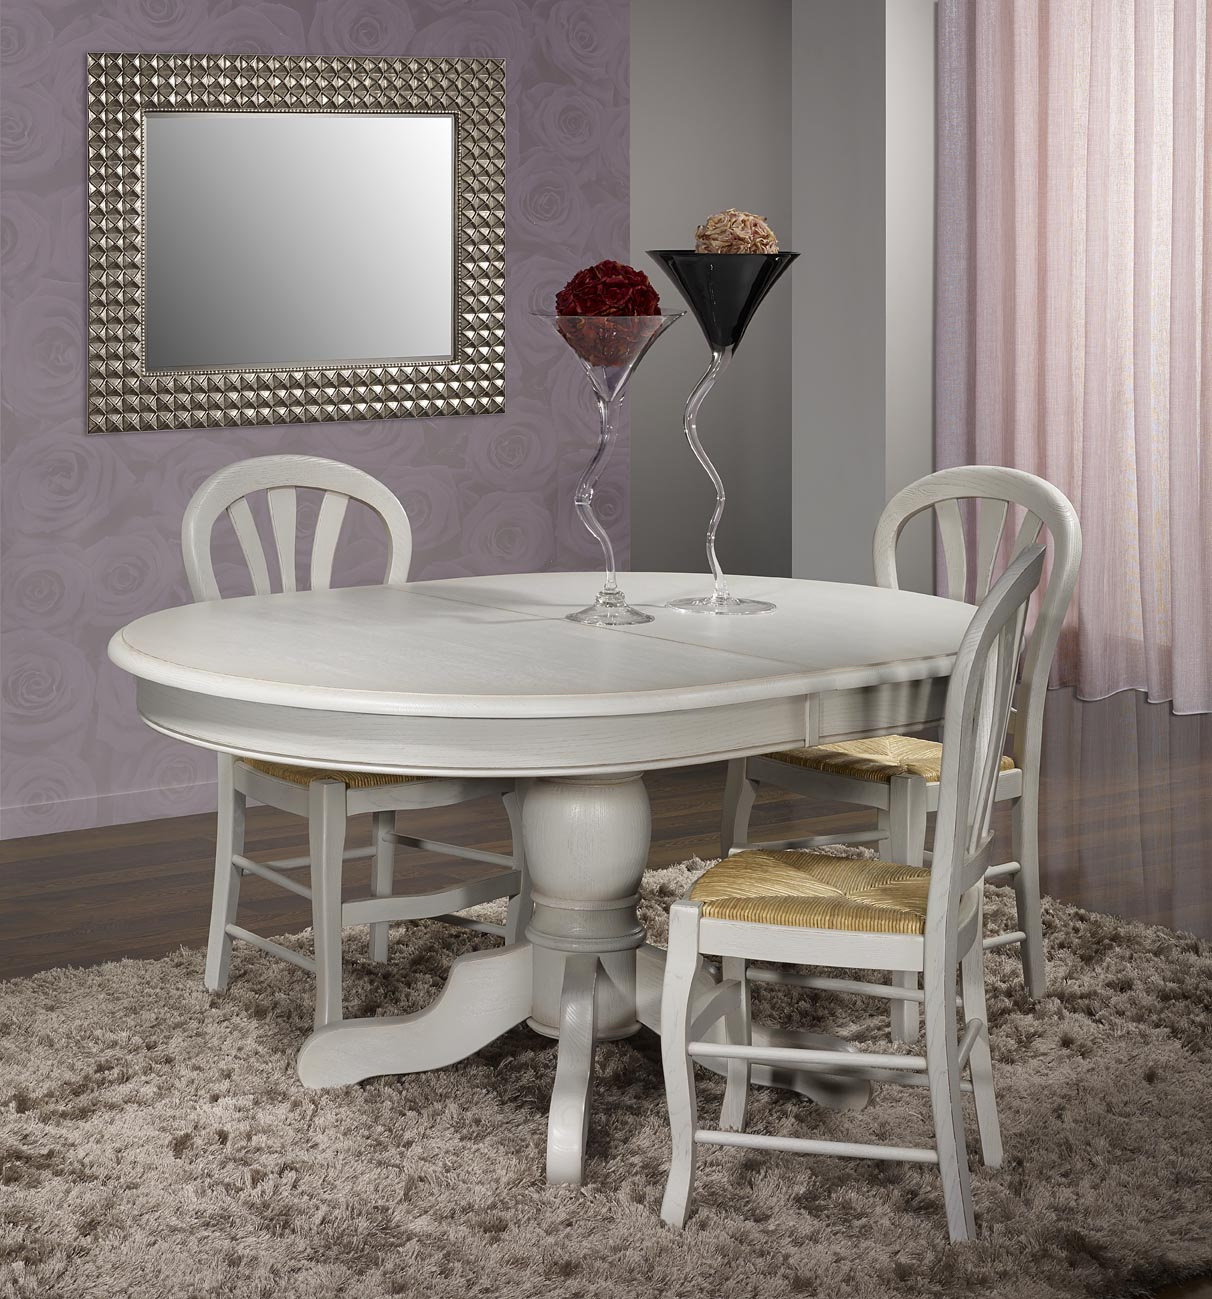 Table ovale pied central romain en ch ne massif de style for Table louis philippe